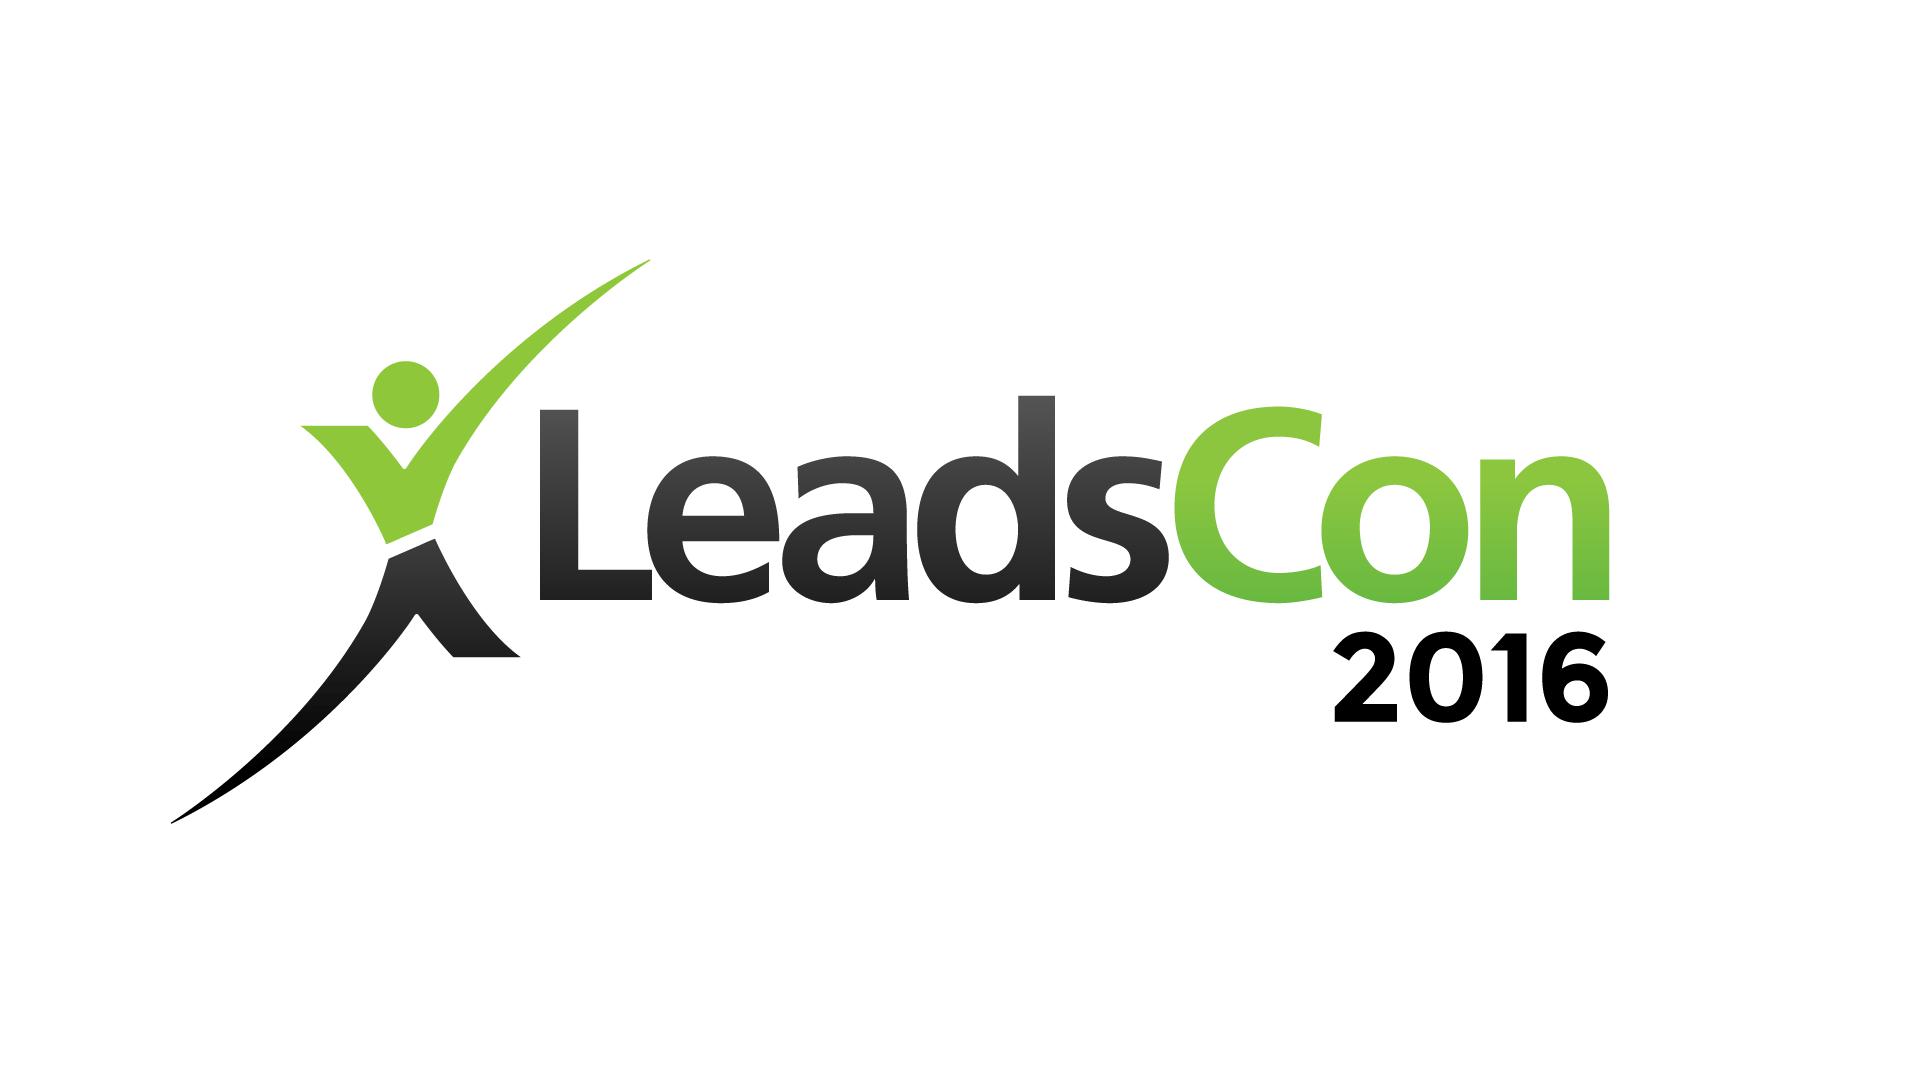 Interview with LeadsCon Content Director Warren Pickett